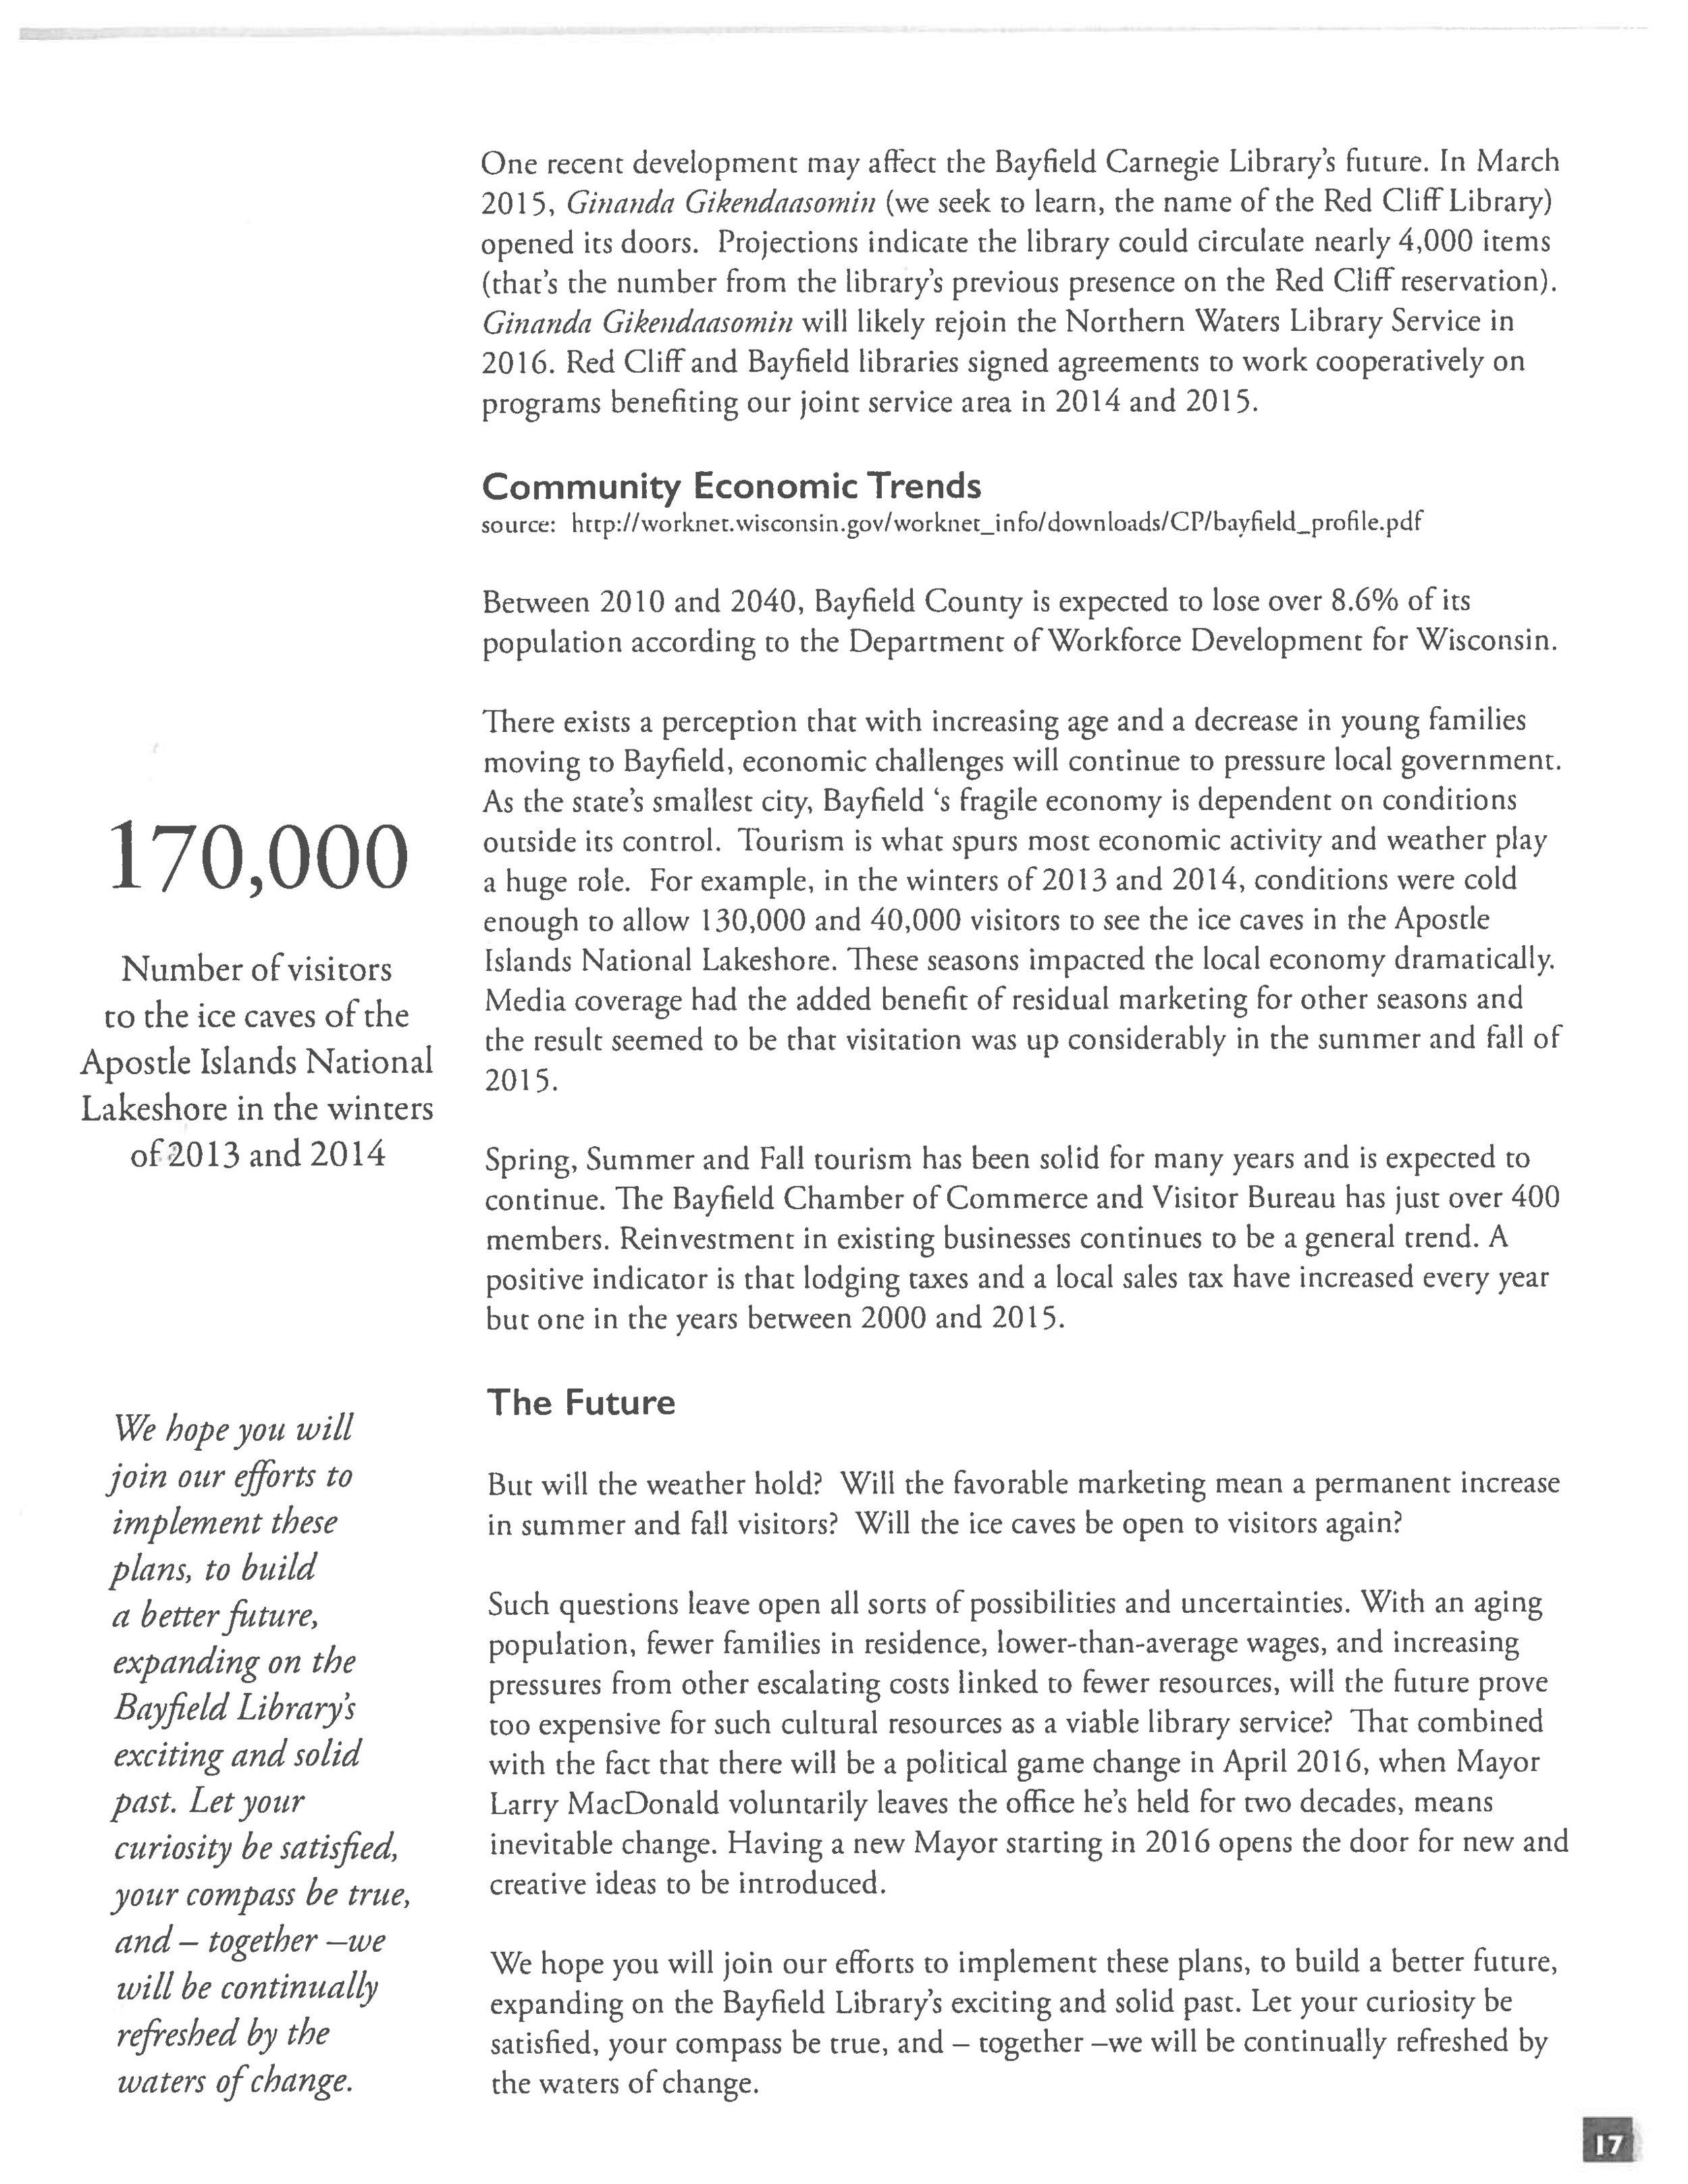 2015-2020 Stategic Plan-HRK 2016 grant_Page_15.jpg